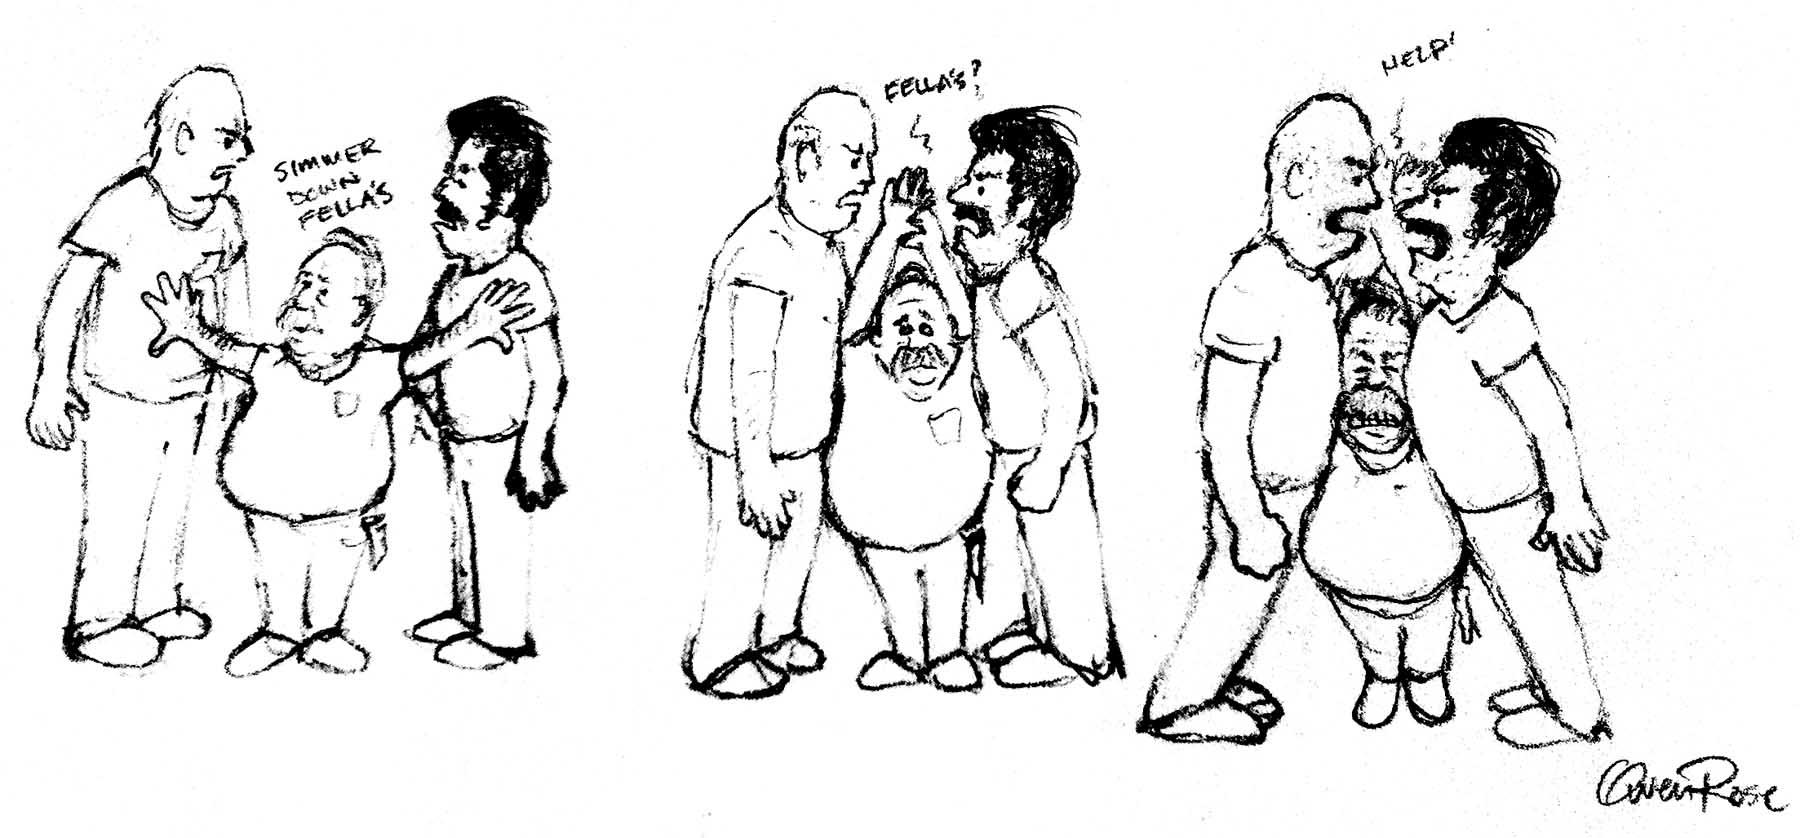 Owen S Cartoons